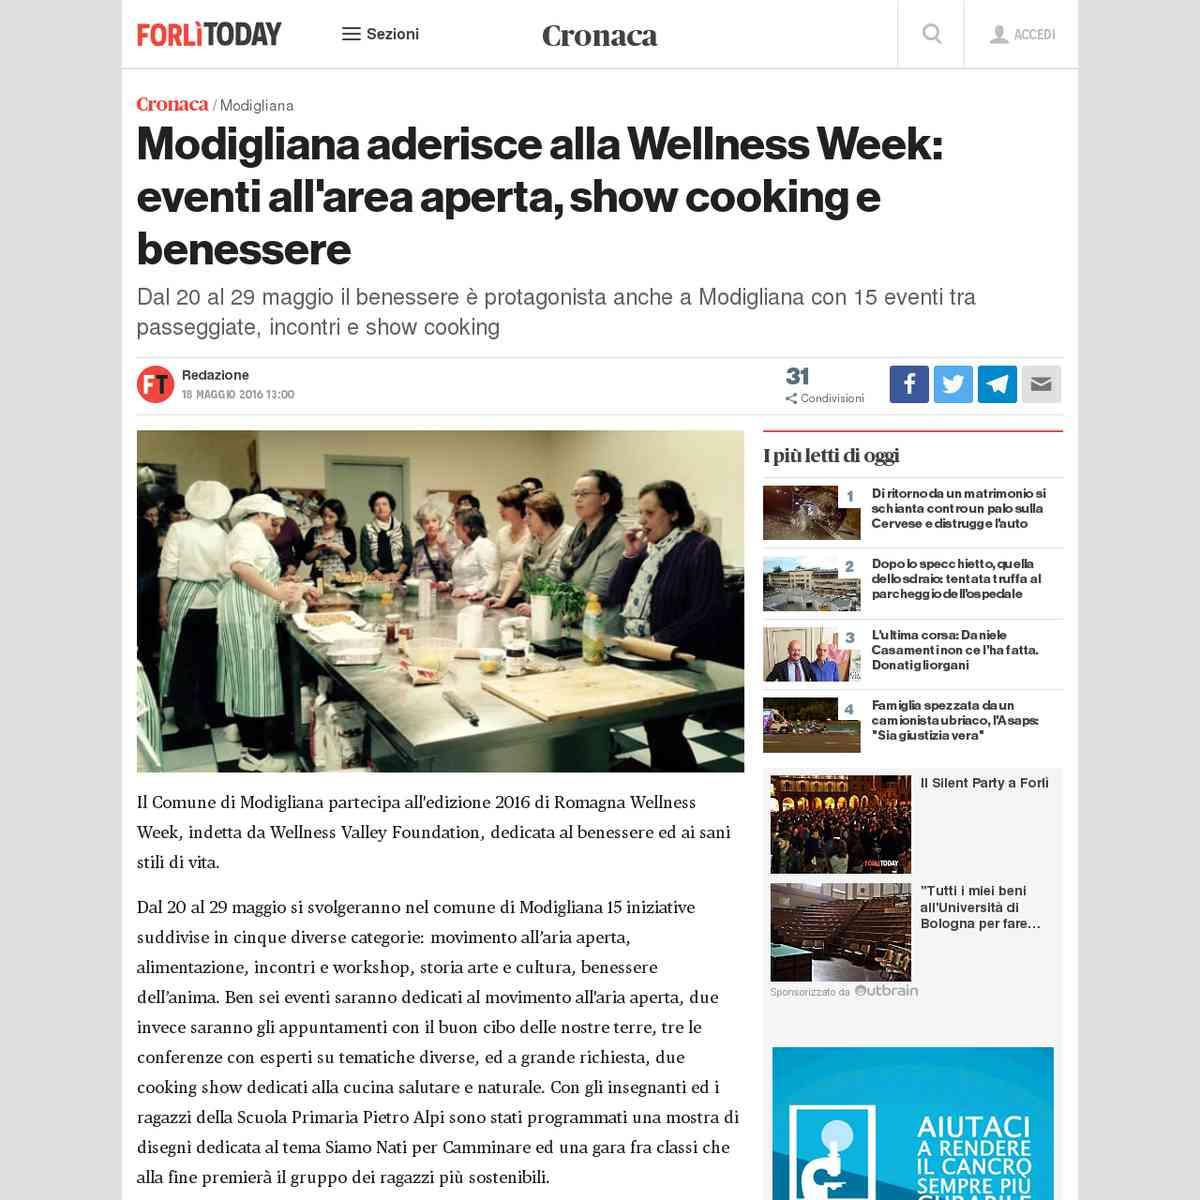 Modigliana aderisce alla Wellness Week: eventi all'area aperta, show cooking e benessere - Forlì T…